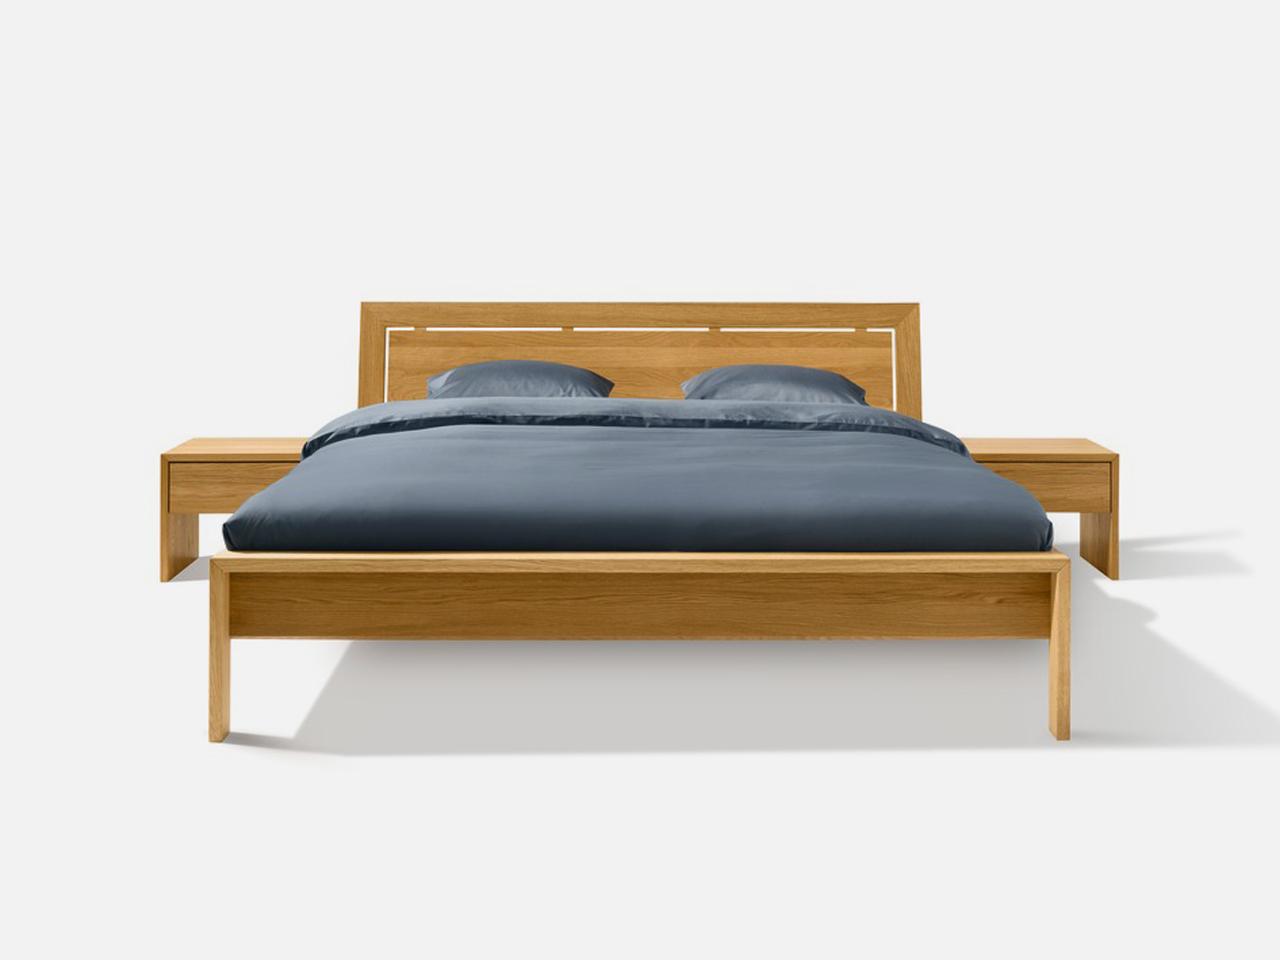 massives holzbett wien. Black Bedroom Furniture Sets. Home Design Ideas